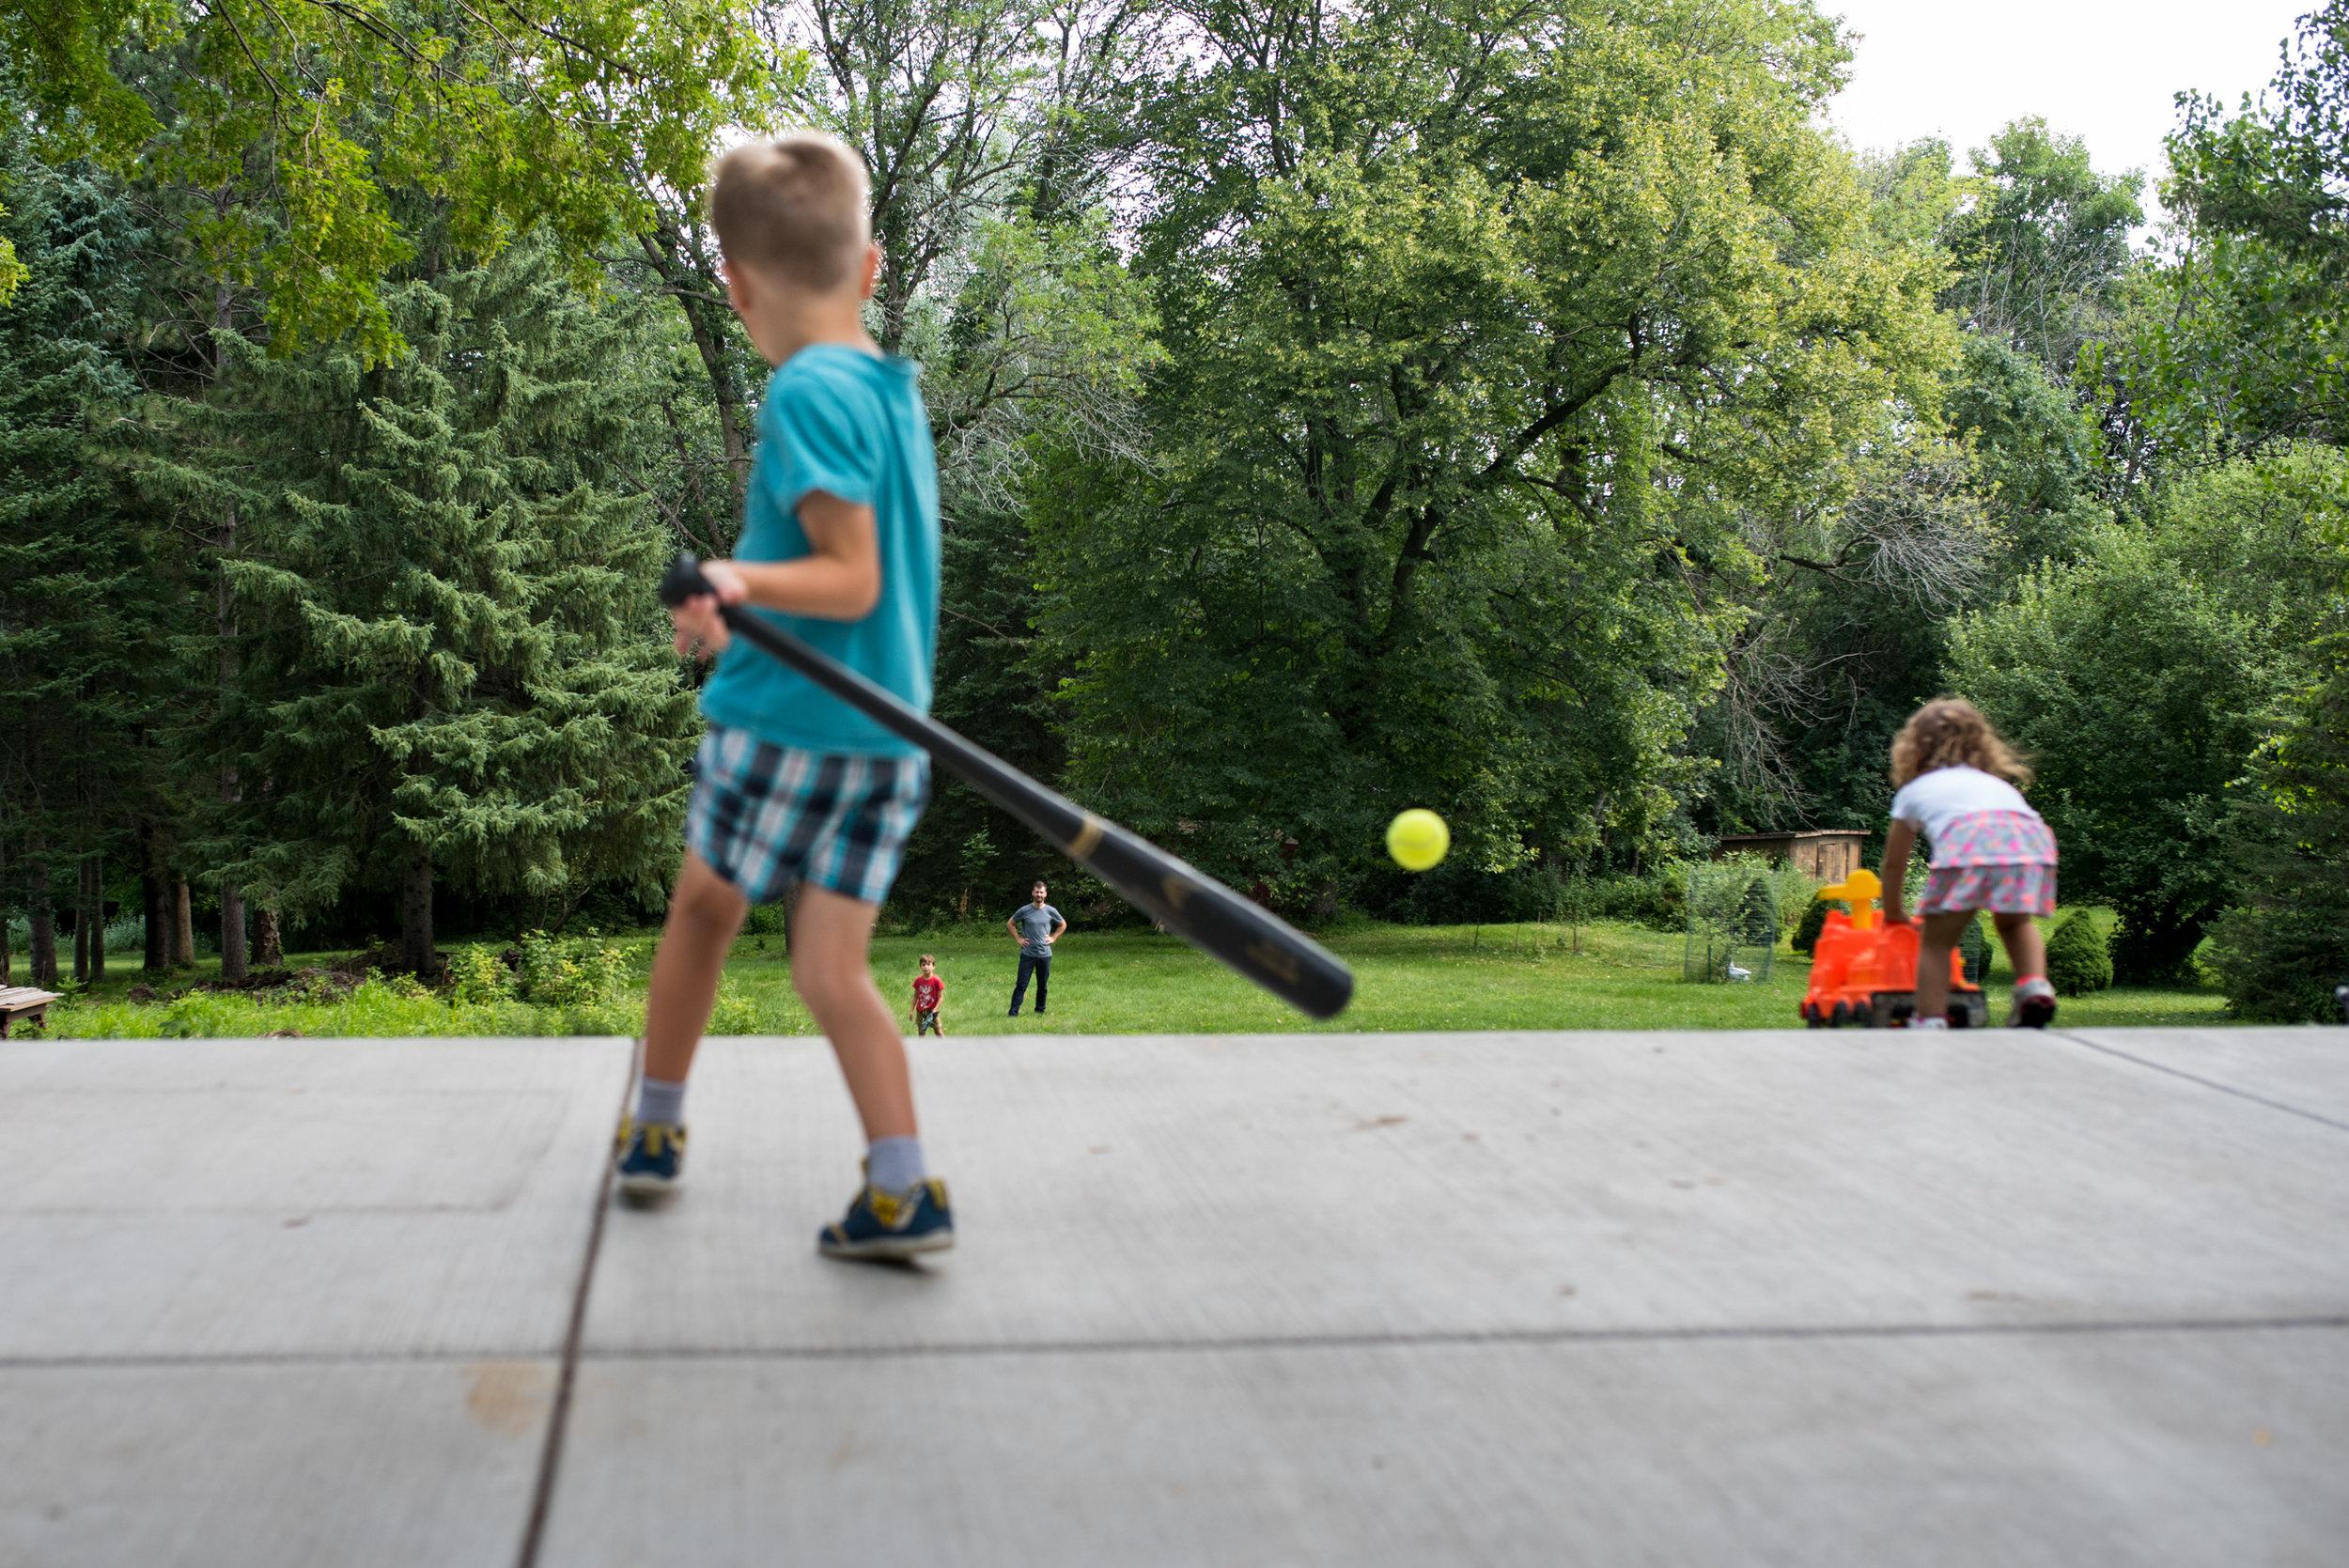 boy hitting baseball in yard with family